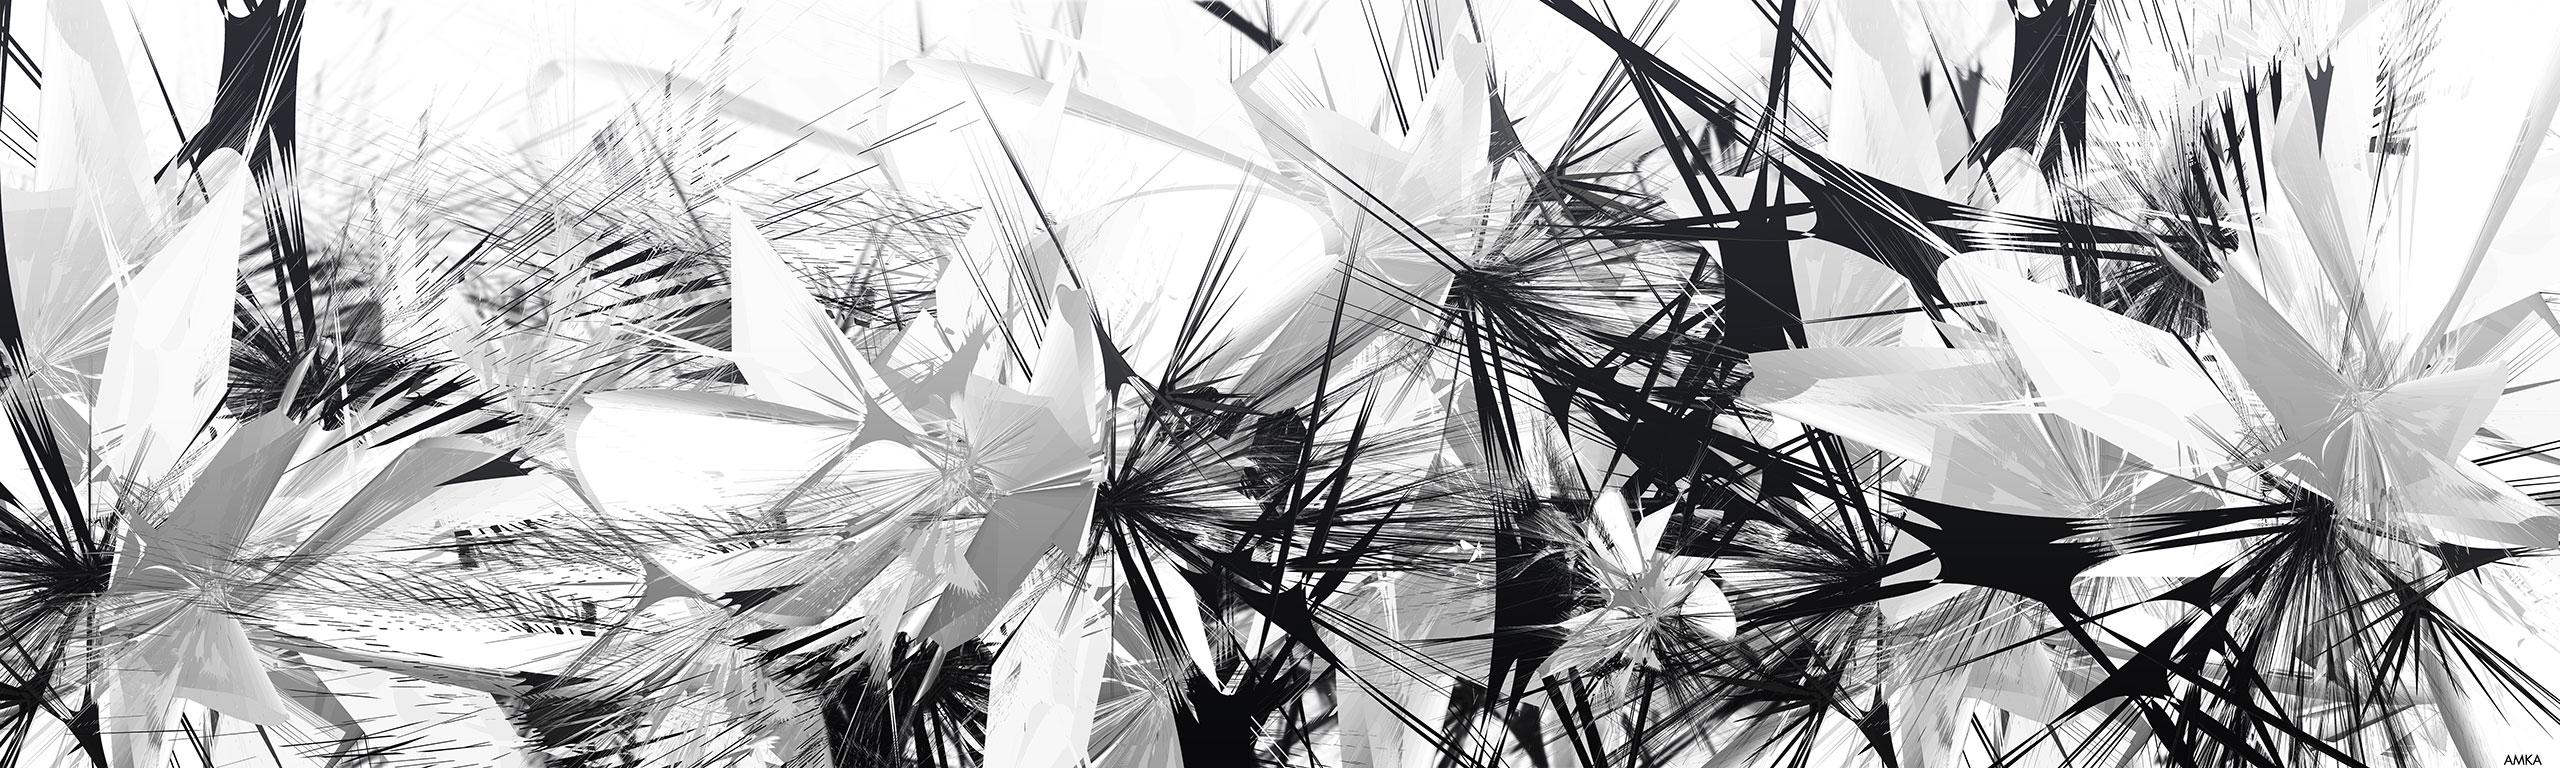 refractions